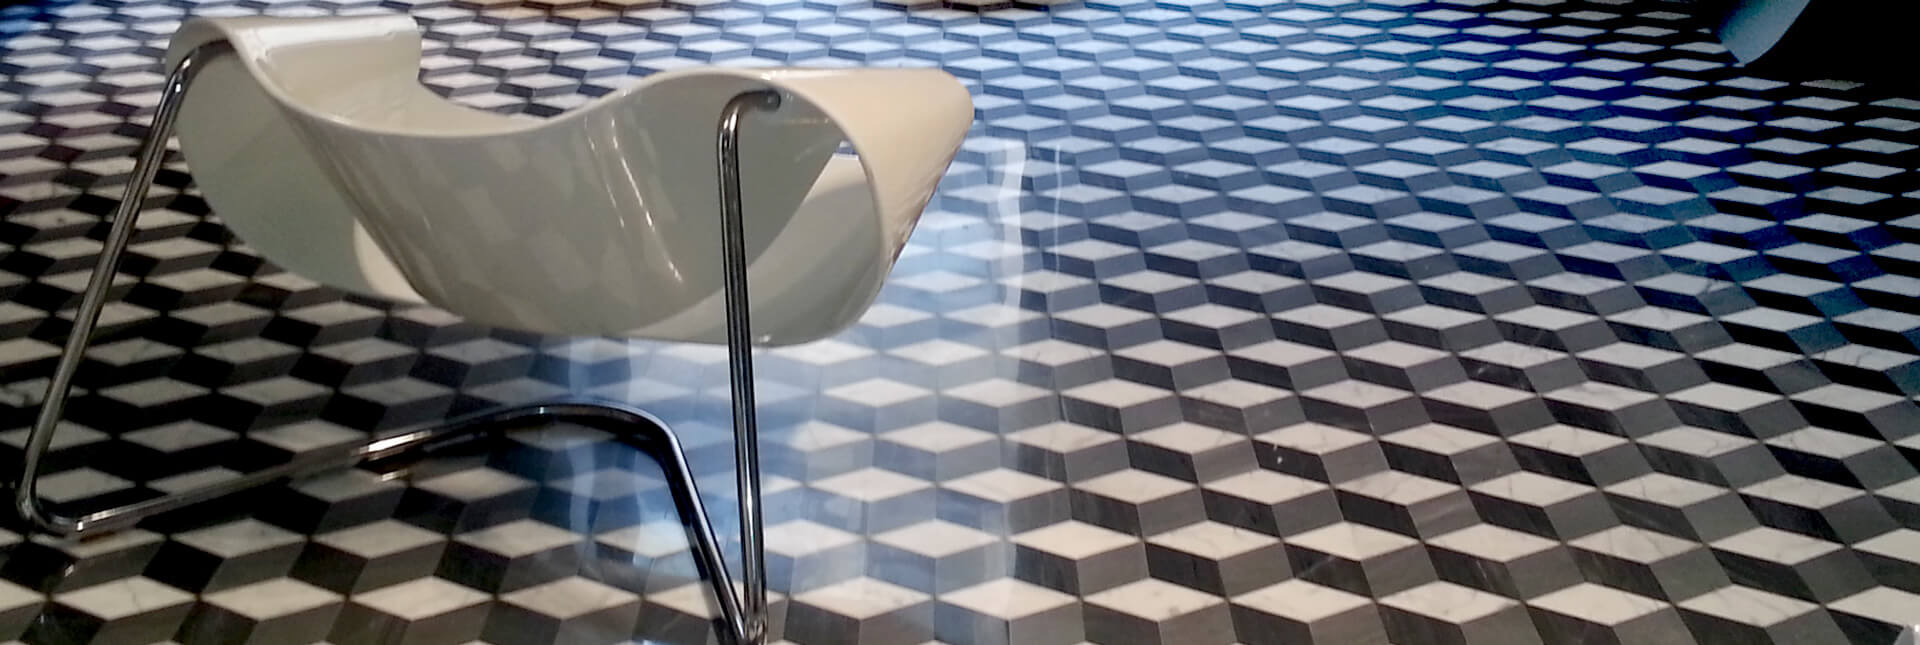 Stone Surgeon - Granite Polished Floor Tiles